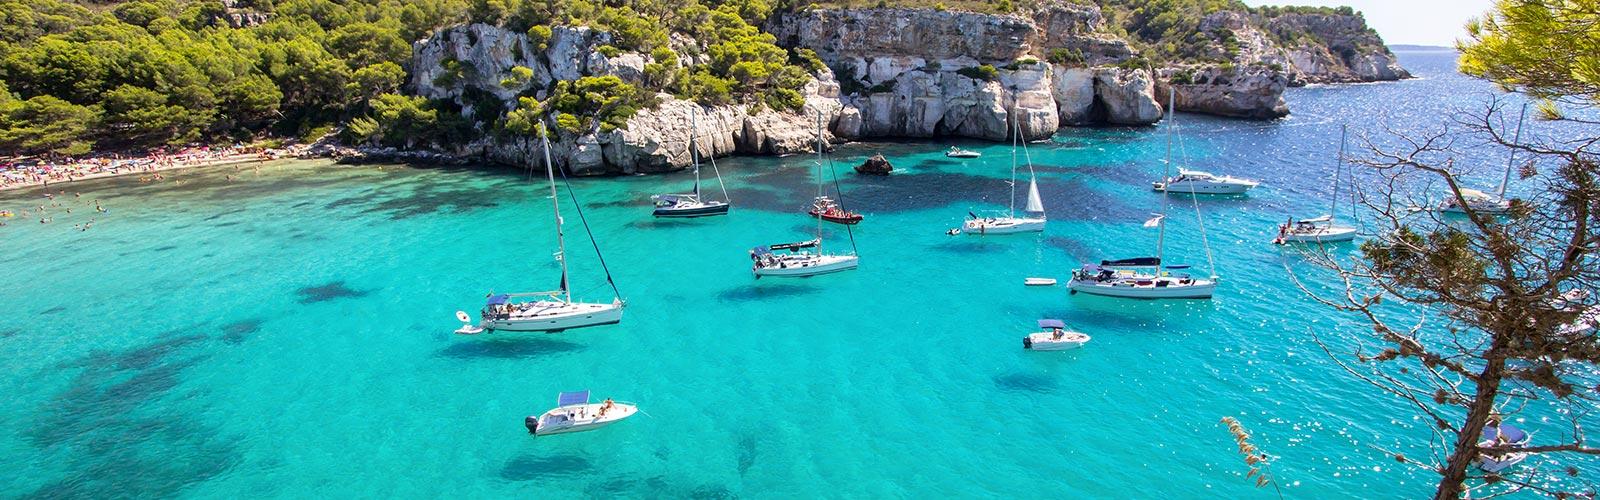 Viaje fotográfico a Menorca. 6 Sep.